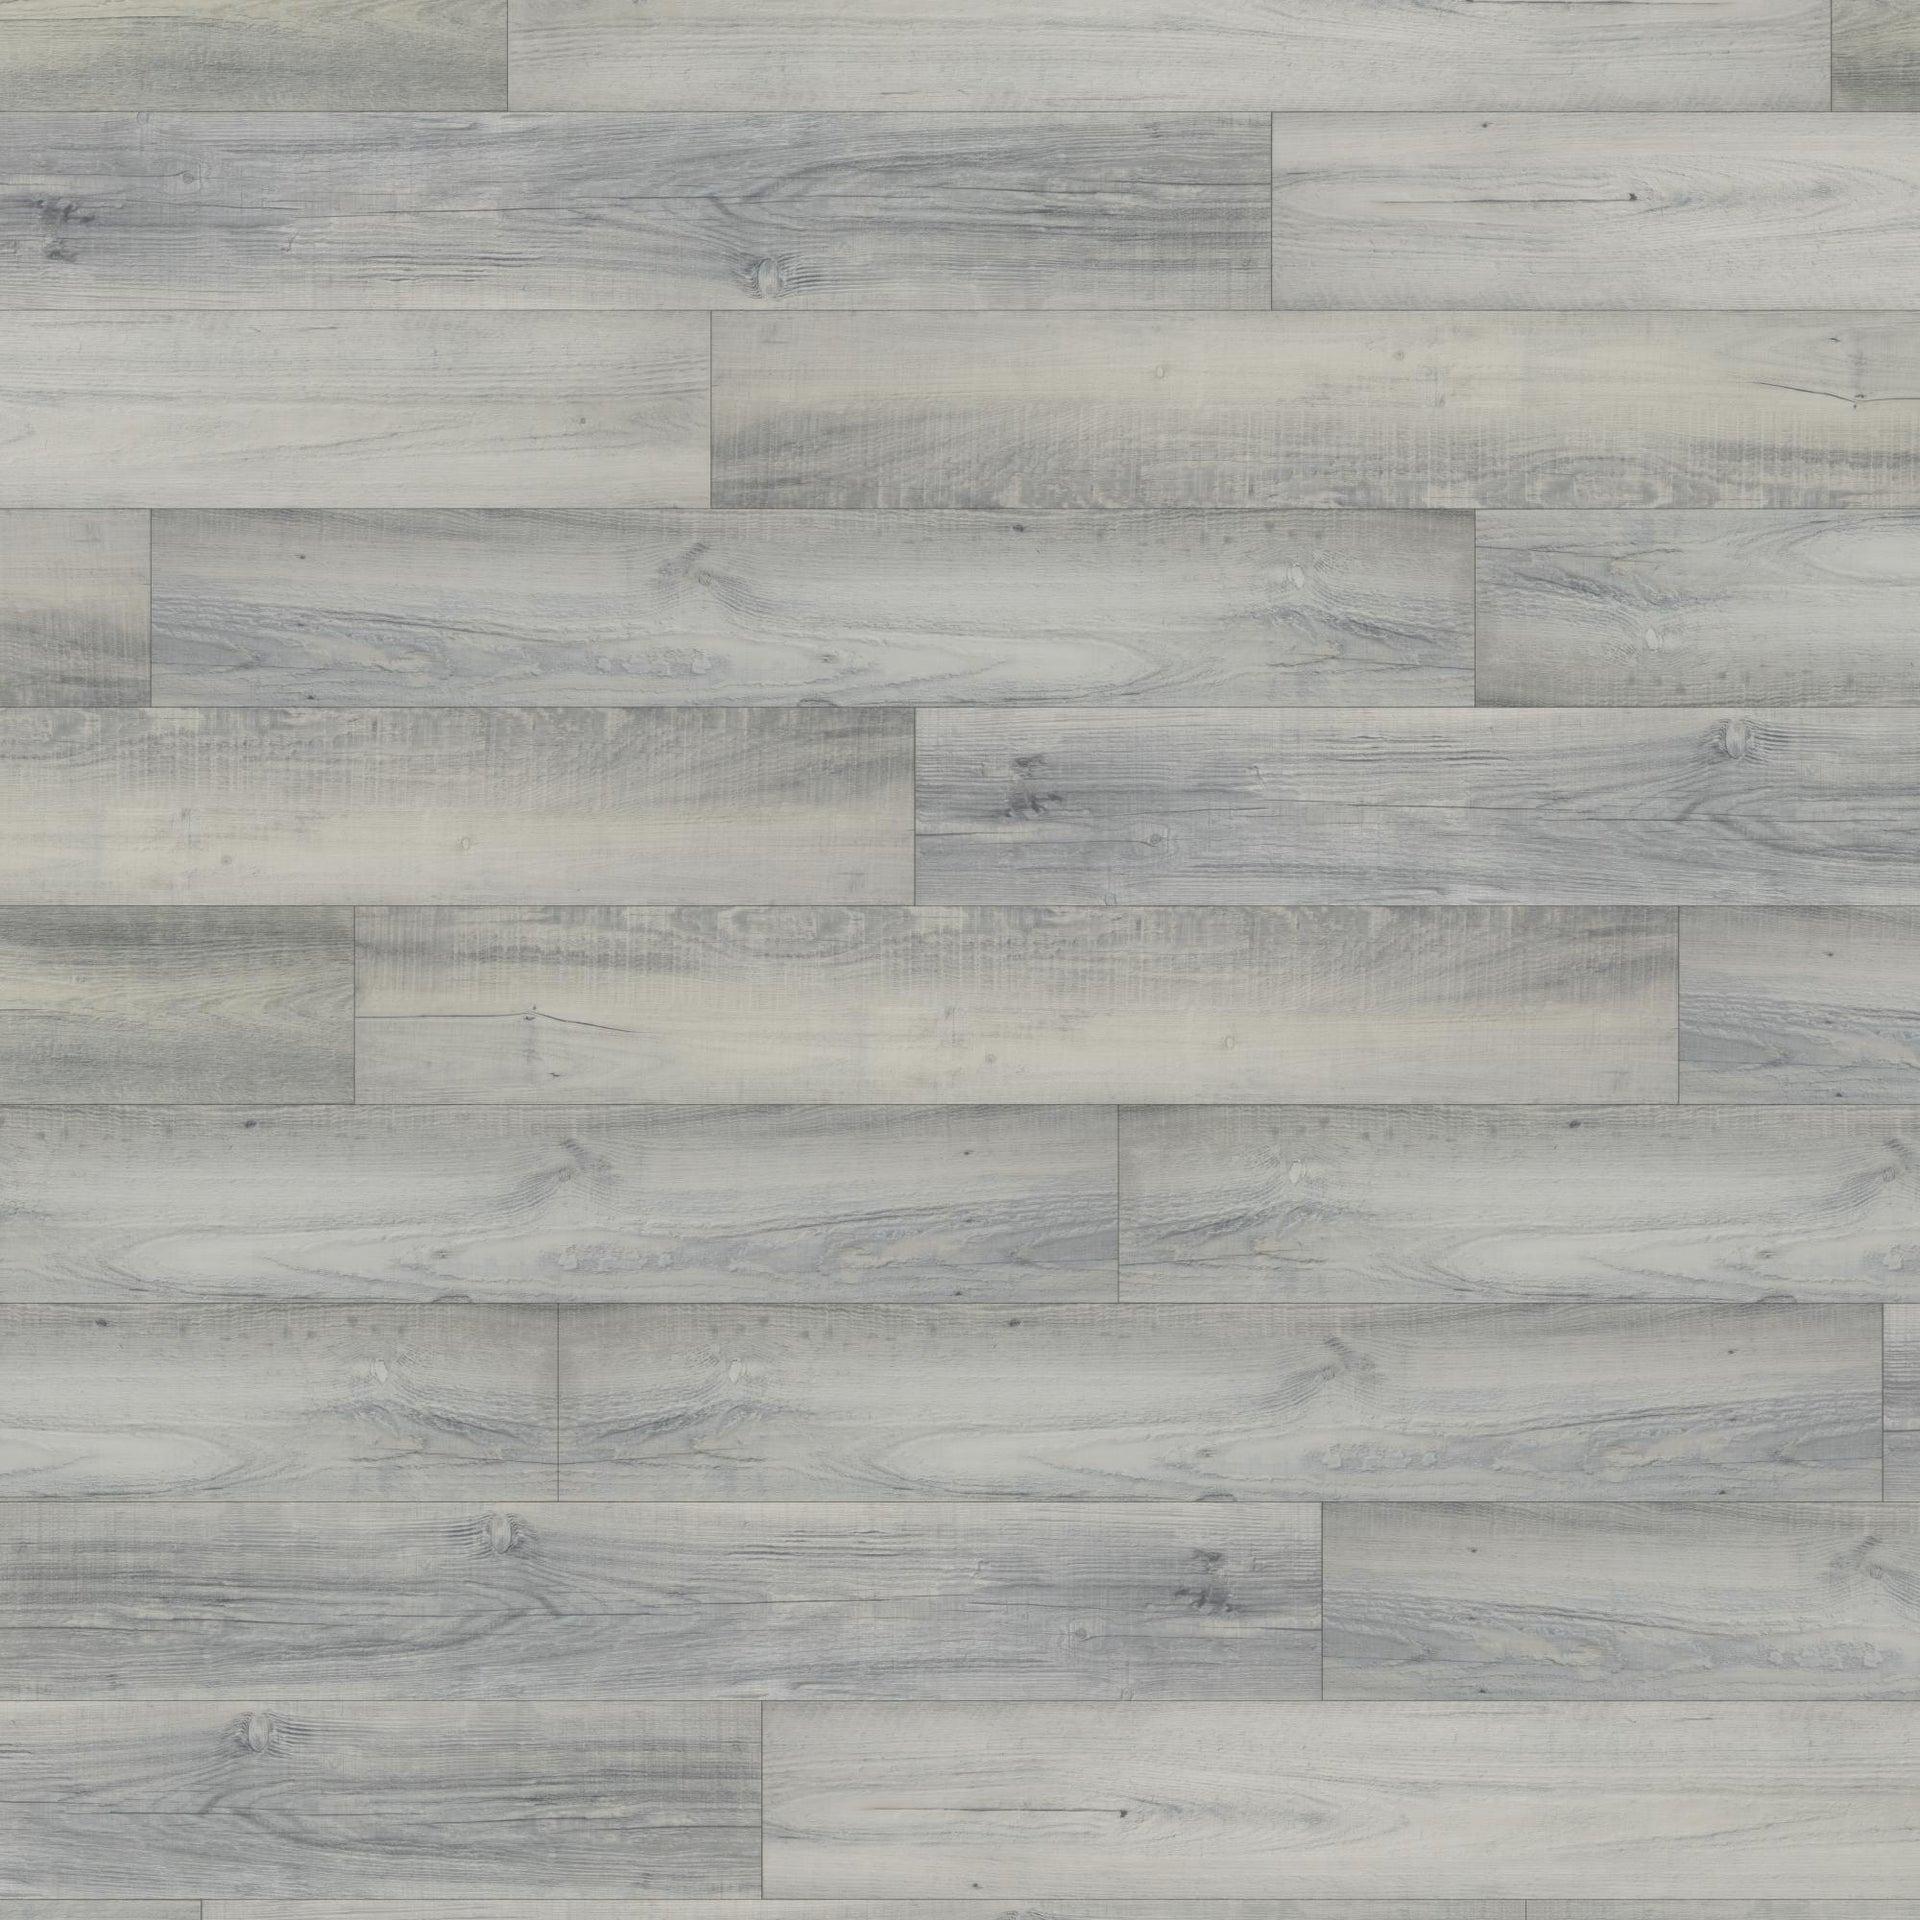 Plancia di vinile flottante clic+ Solor Sp 5 mm grigio / argento - 2